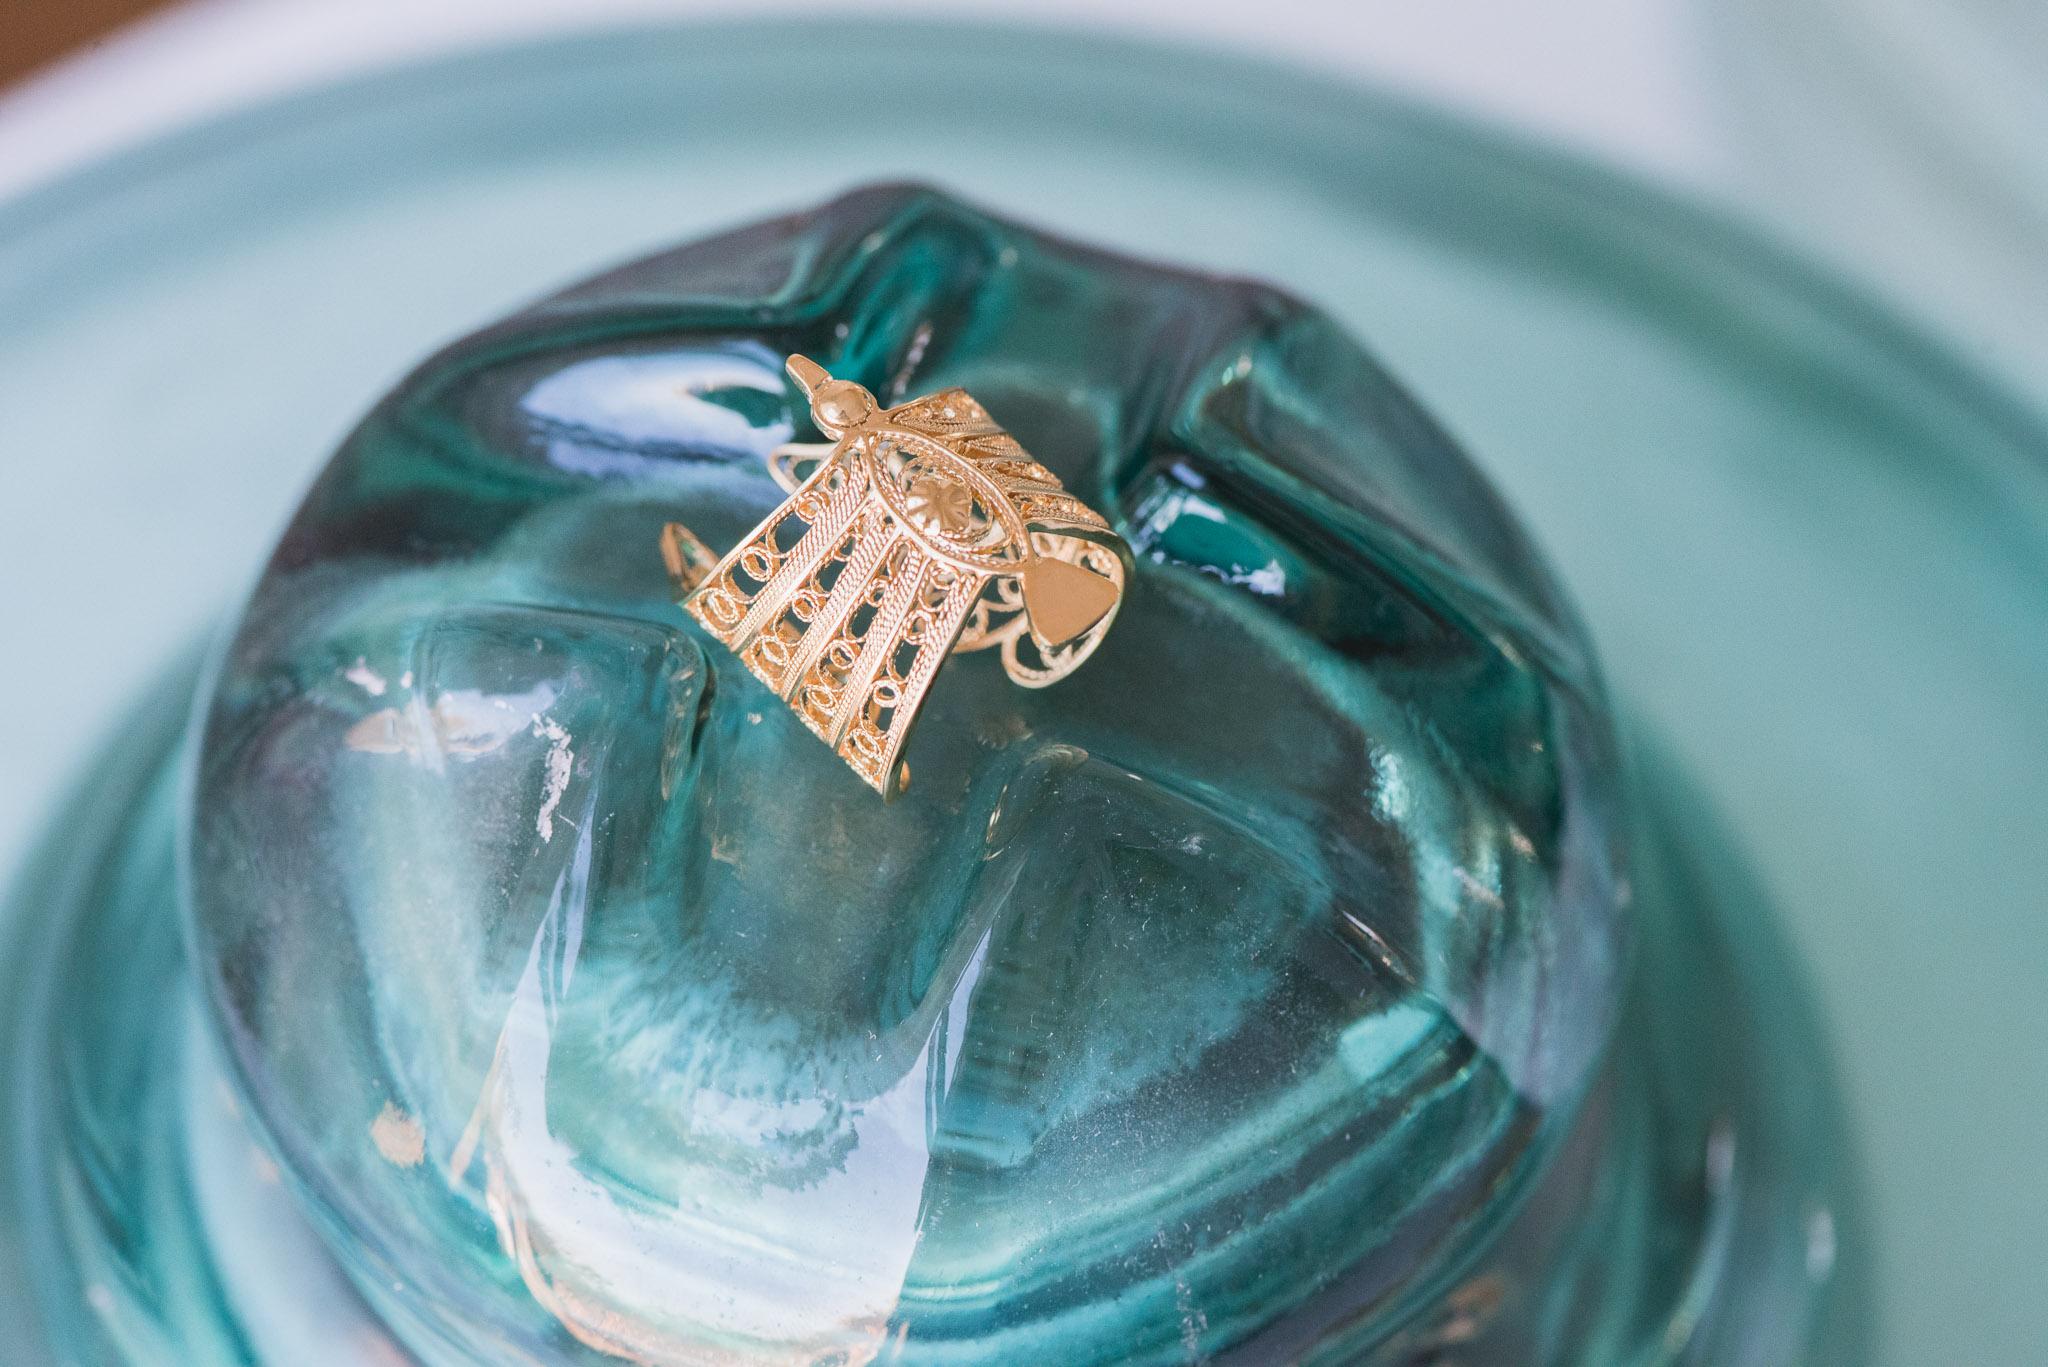 Arabel_Lebrusan_Jewellery_Emma_Hare_Photography__Ethical_Engagement_Rings-10.jpg